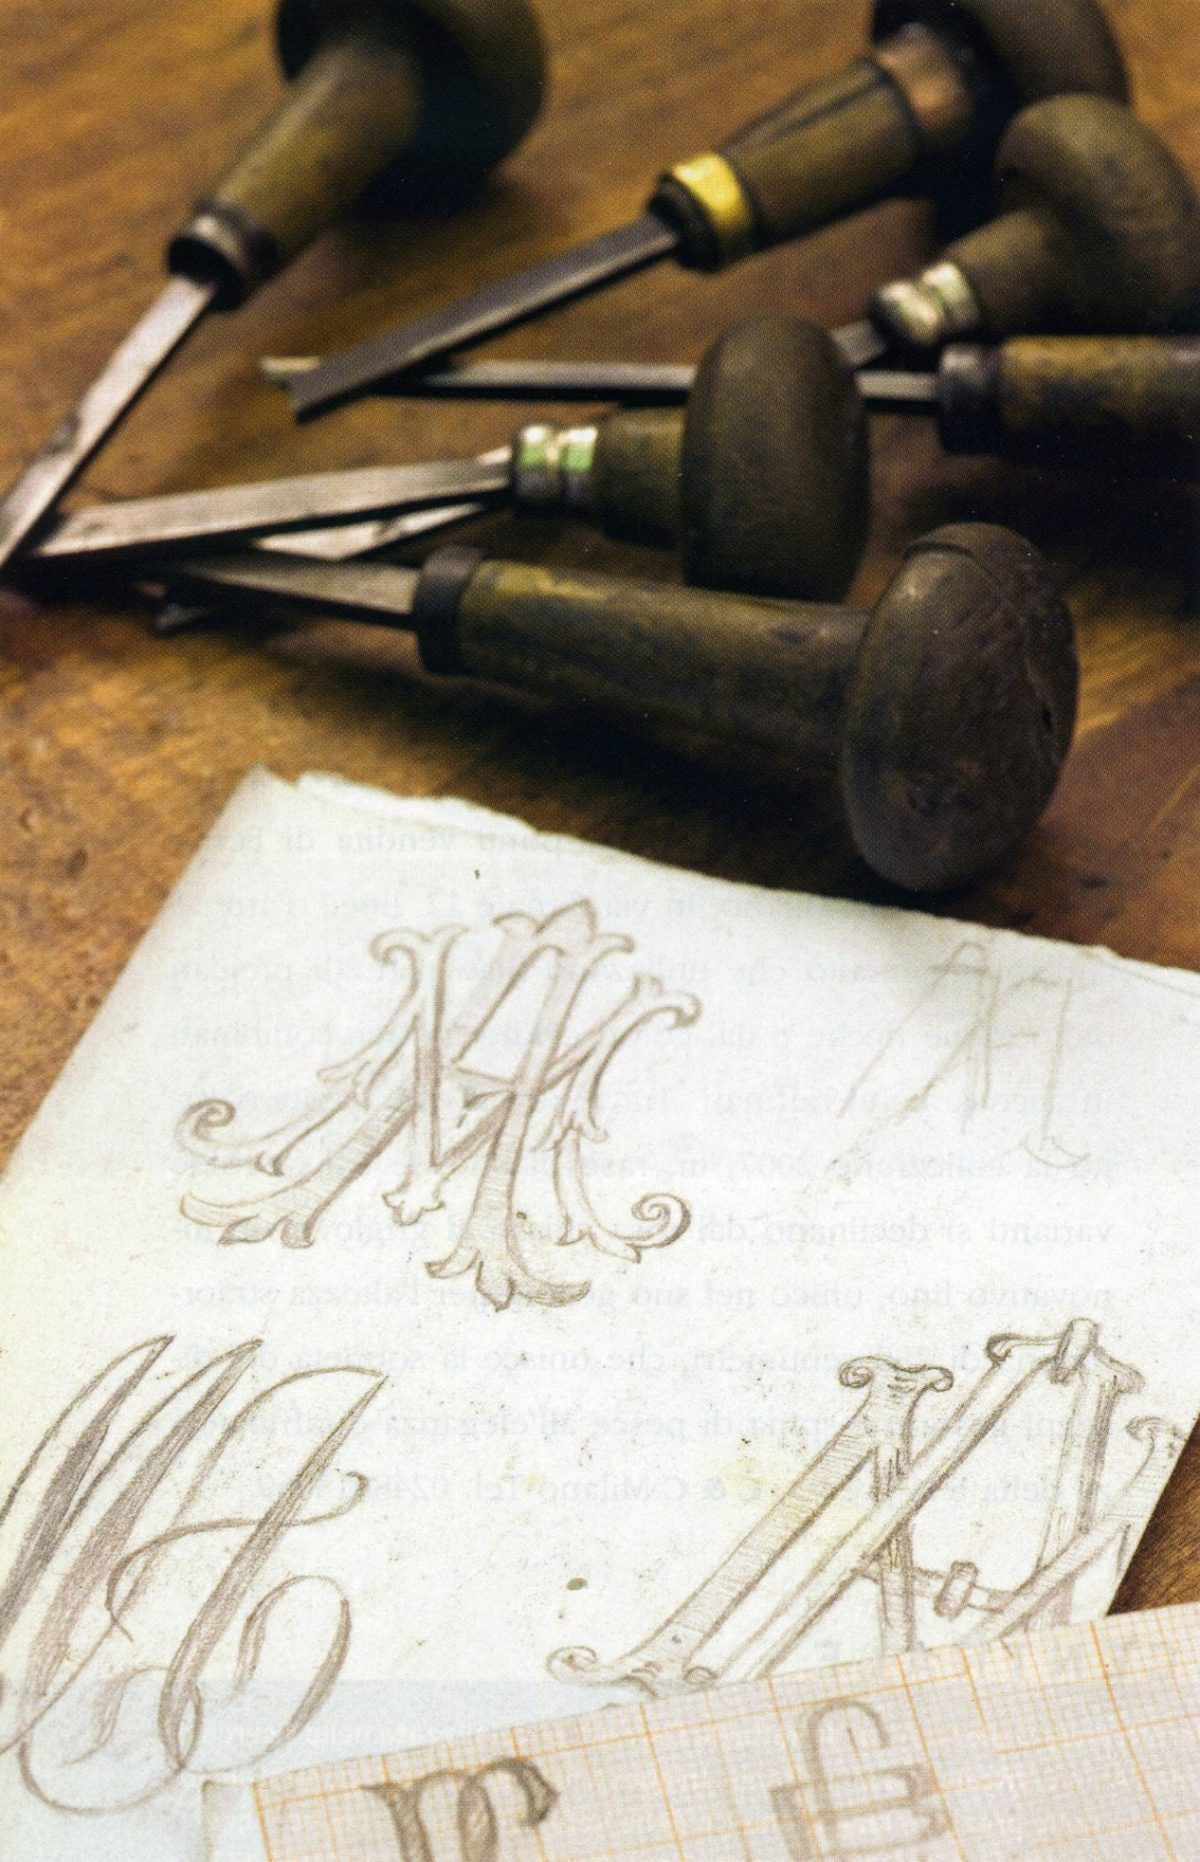 Drawing hand engraving tools